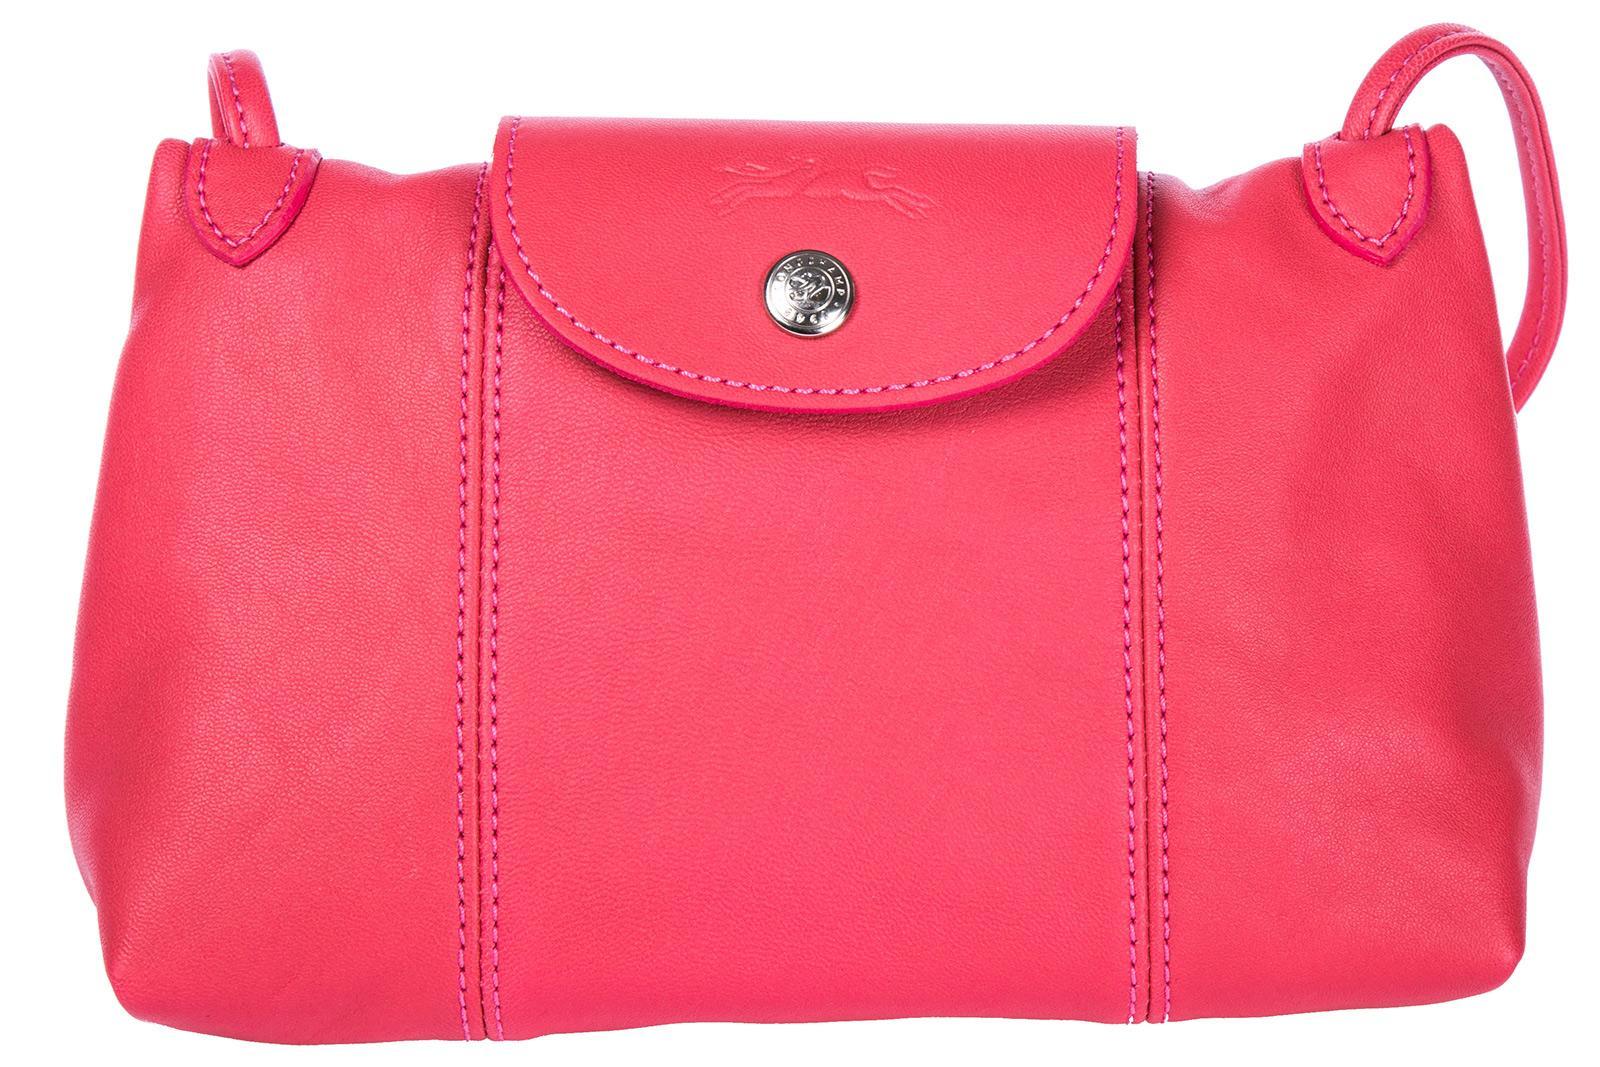 Longchamp Women's Leather Cross-body Messenger Shoulder Bag In Pink